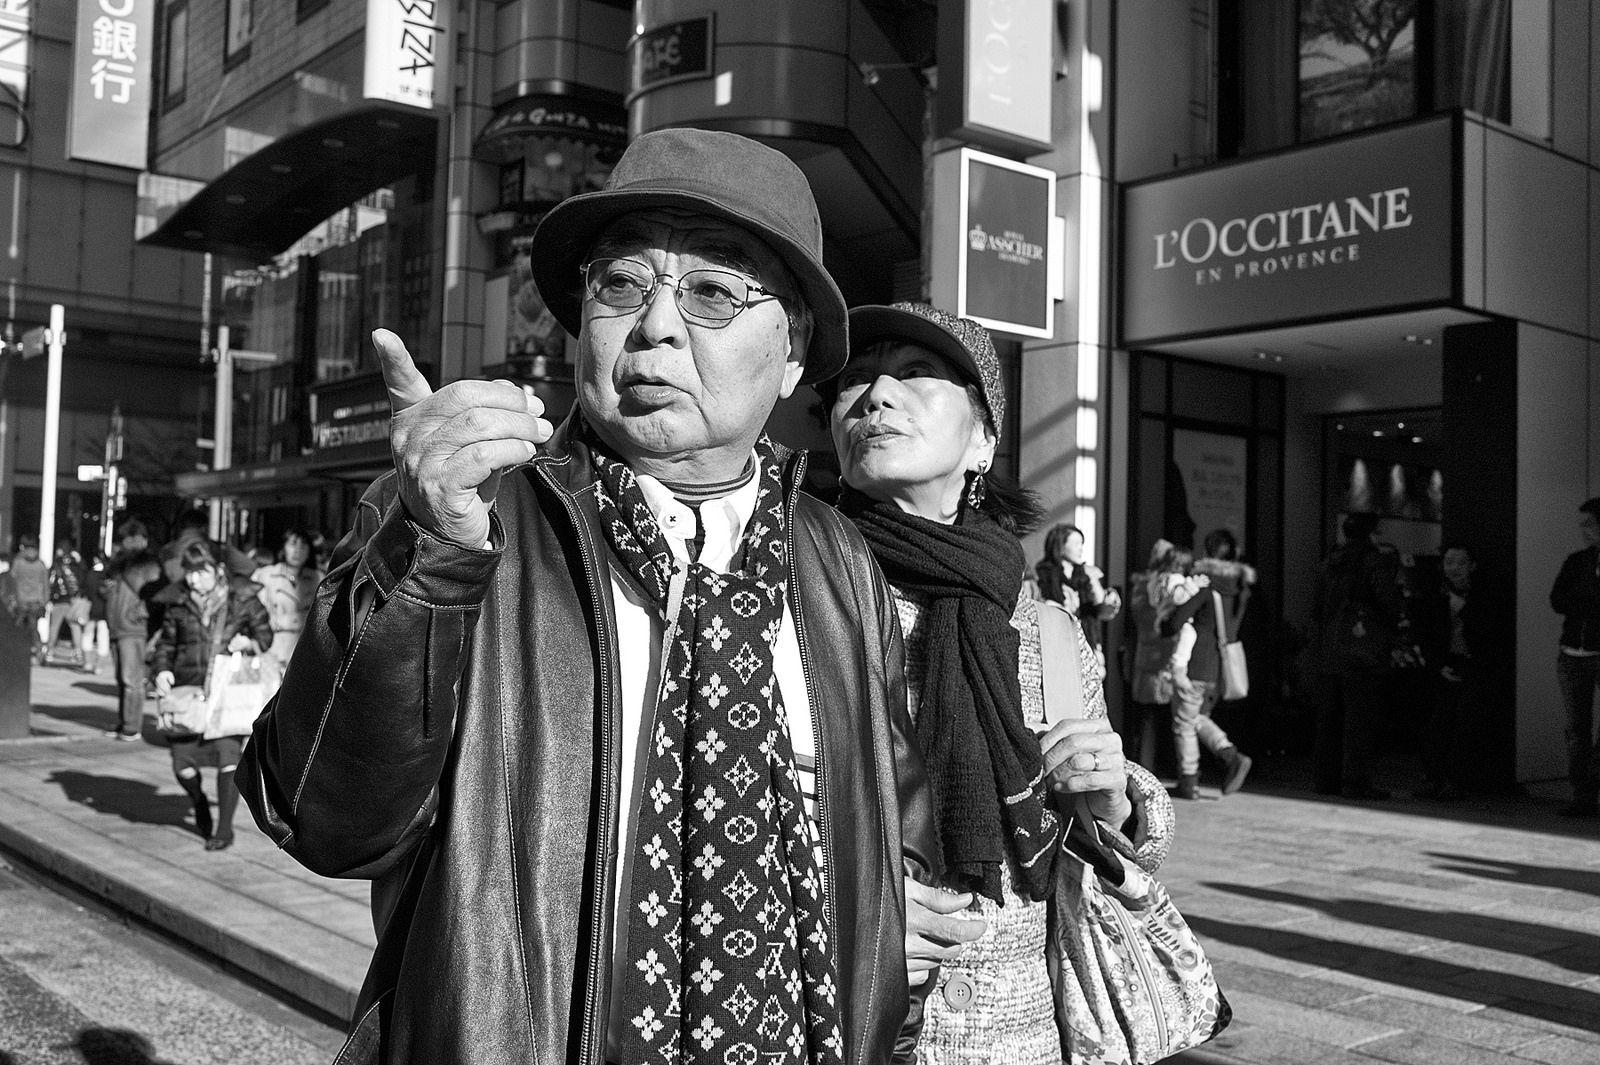 Finger pointing 2 | Flickr - Photo Sharing!